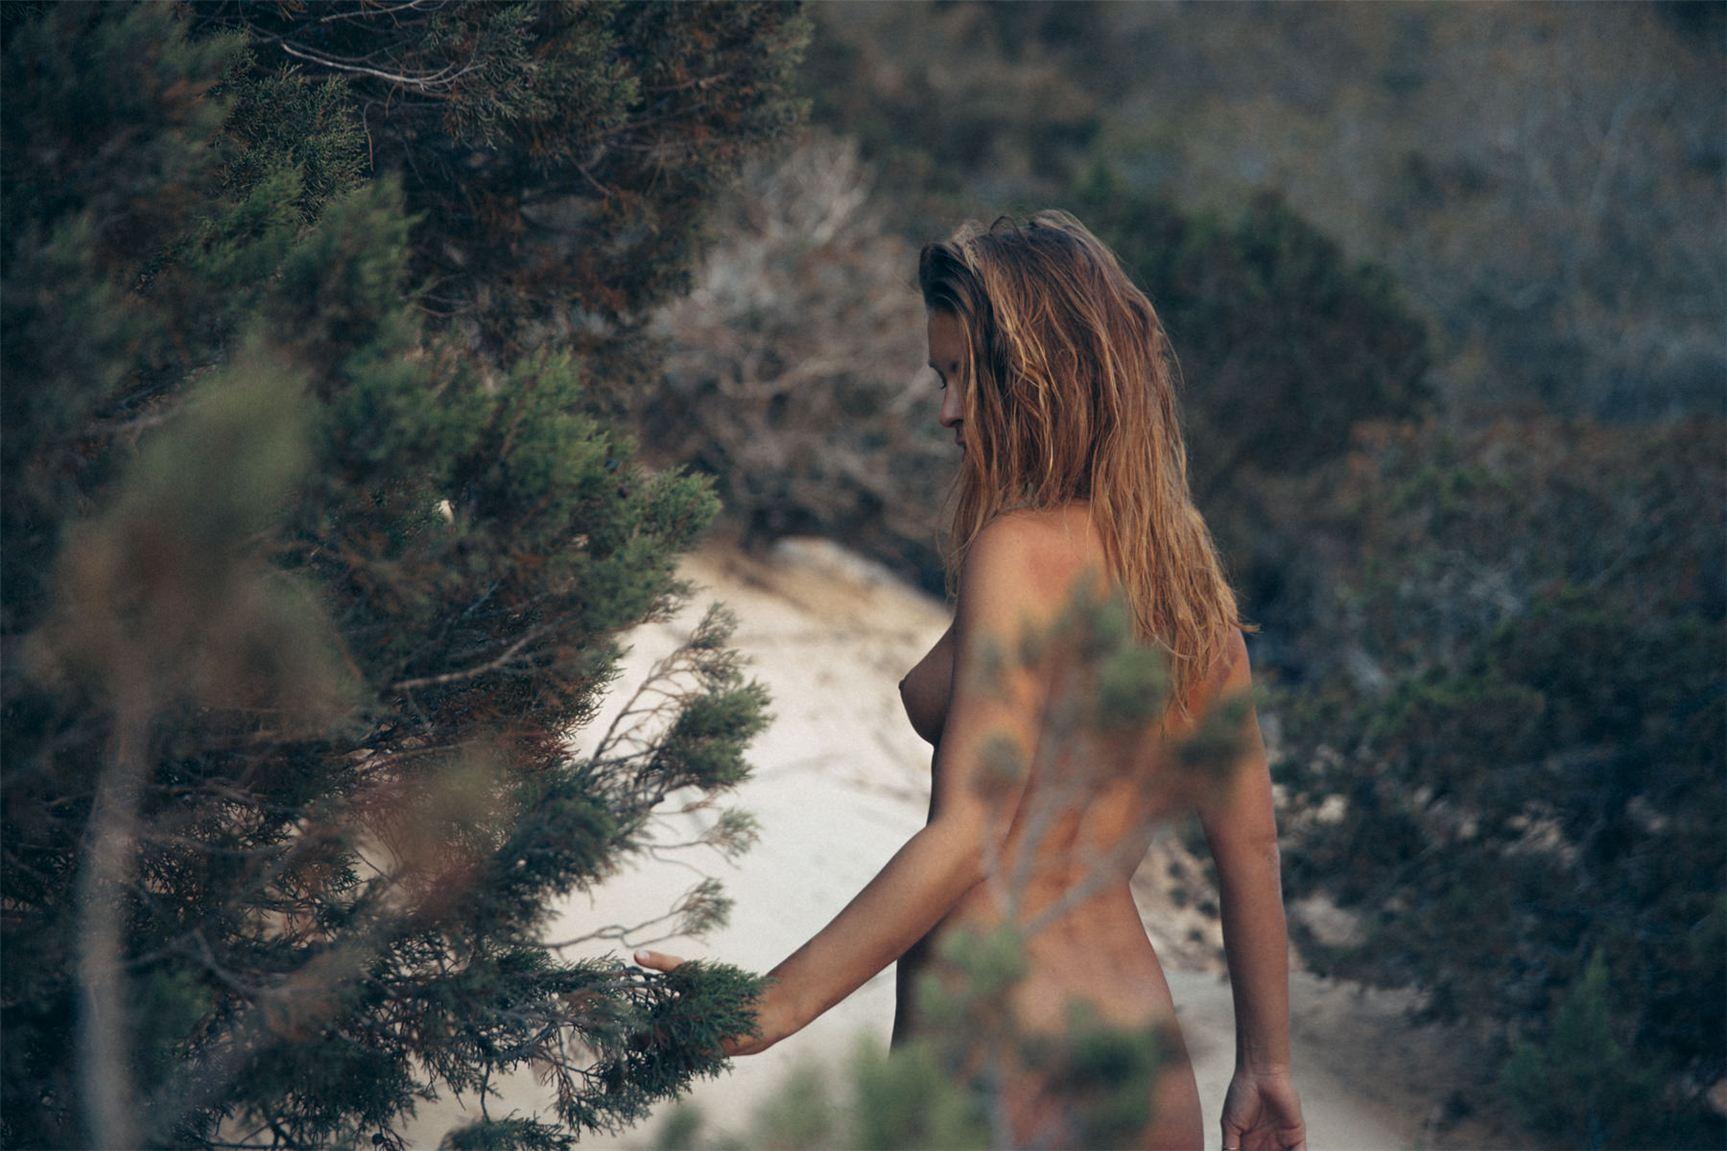 Мариса Папен / Marisa Papen by Jorg Billwitz